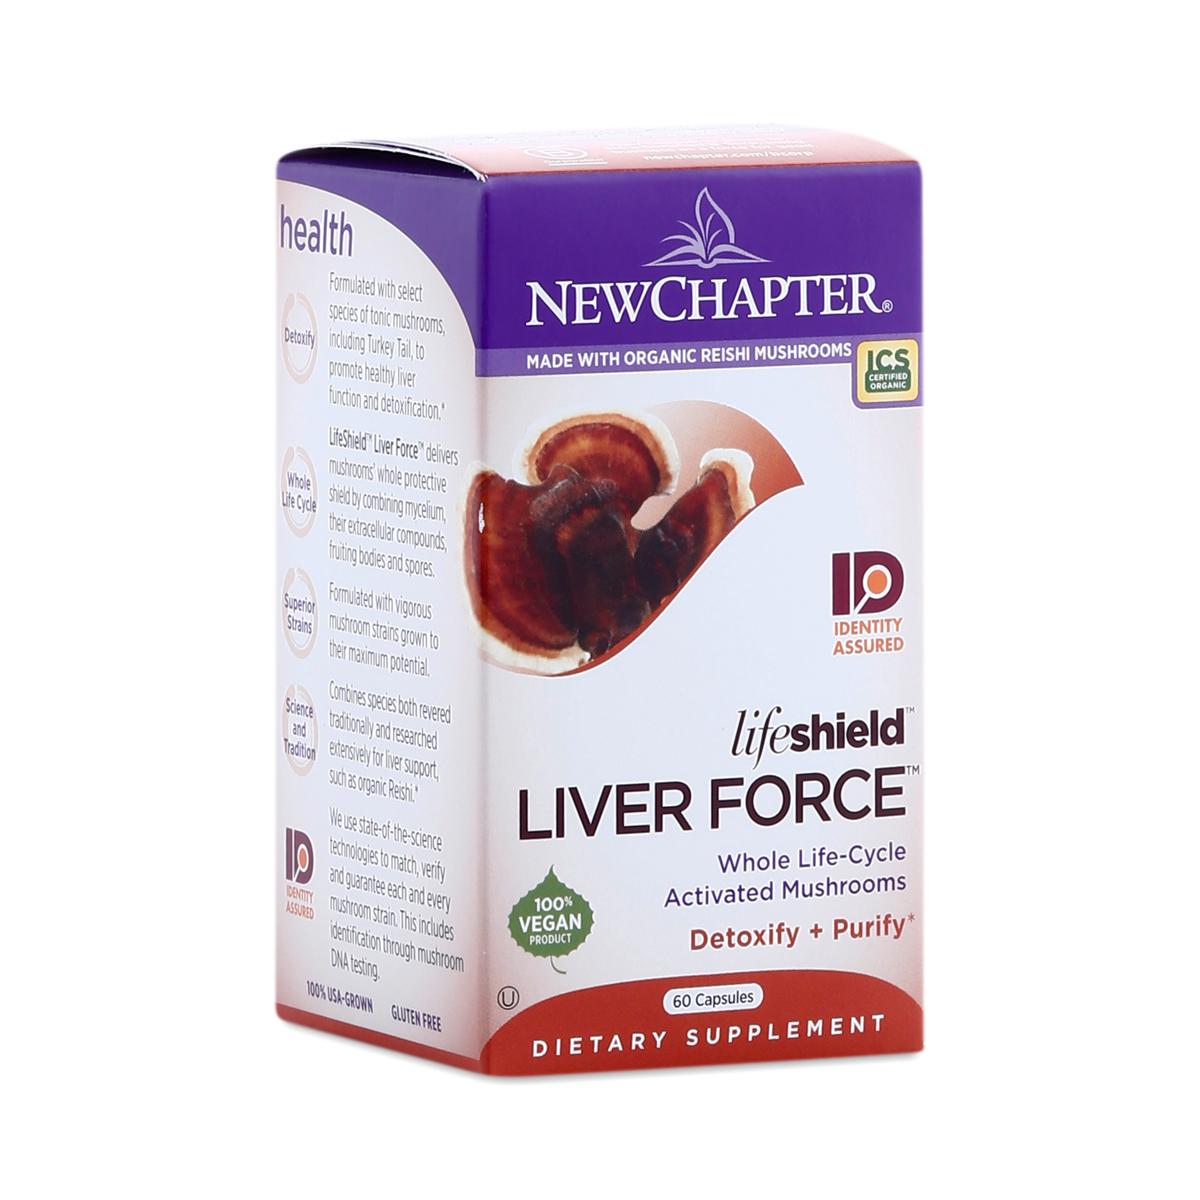 LifeShield Mushroom Liver Force